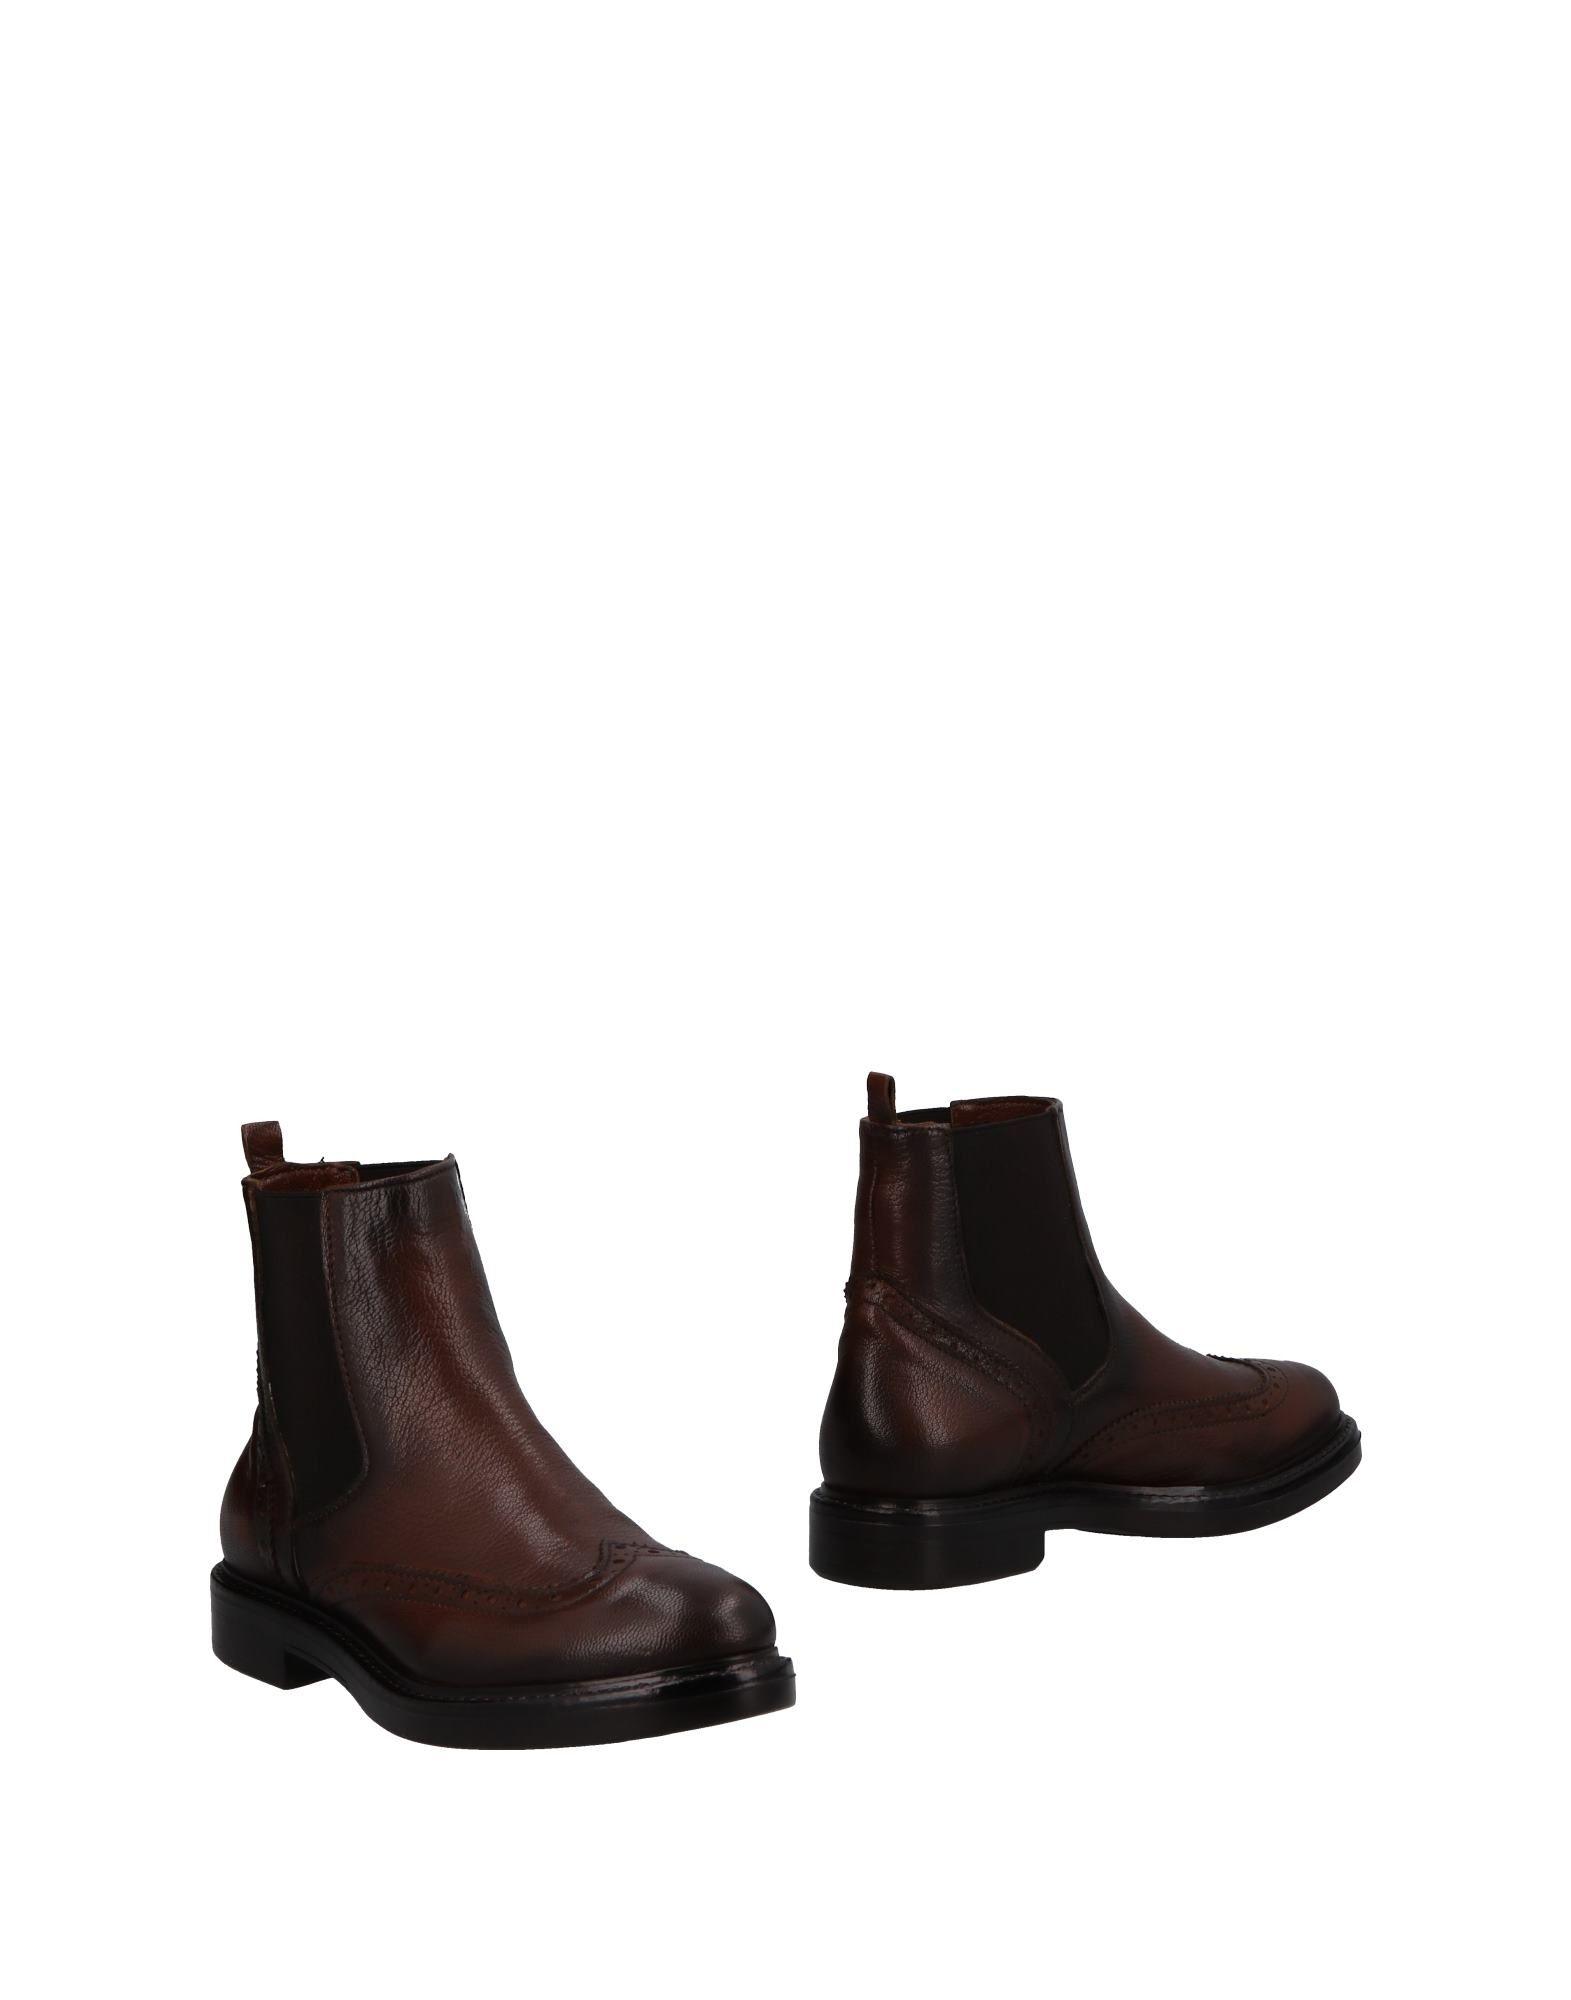 Fabbrica Deicolli Chelsea Boots 11492464KN Damen  11492464KN Boots  eed564